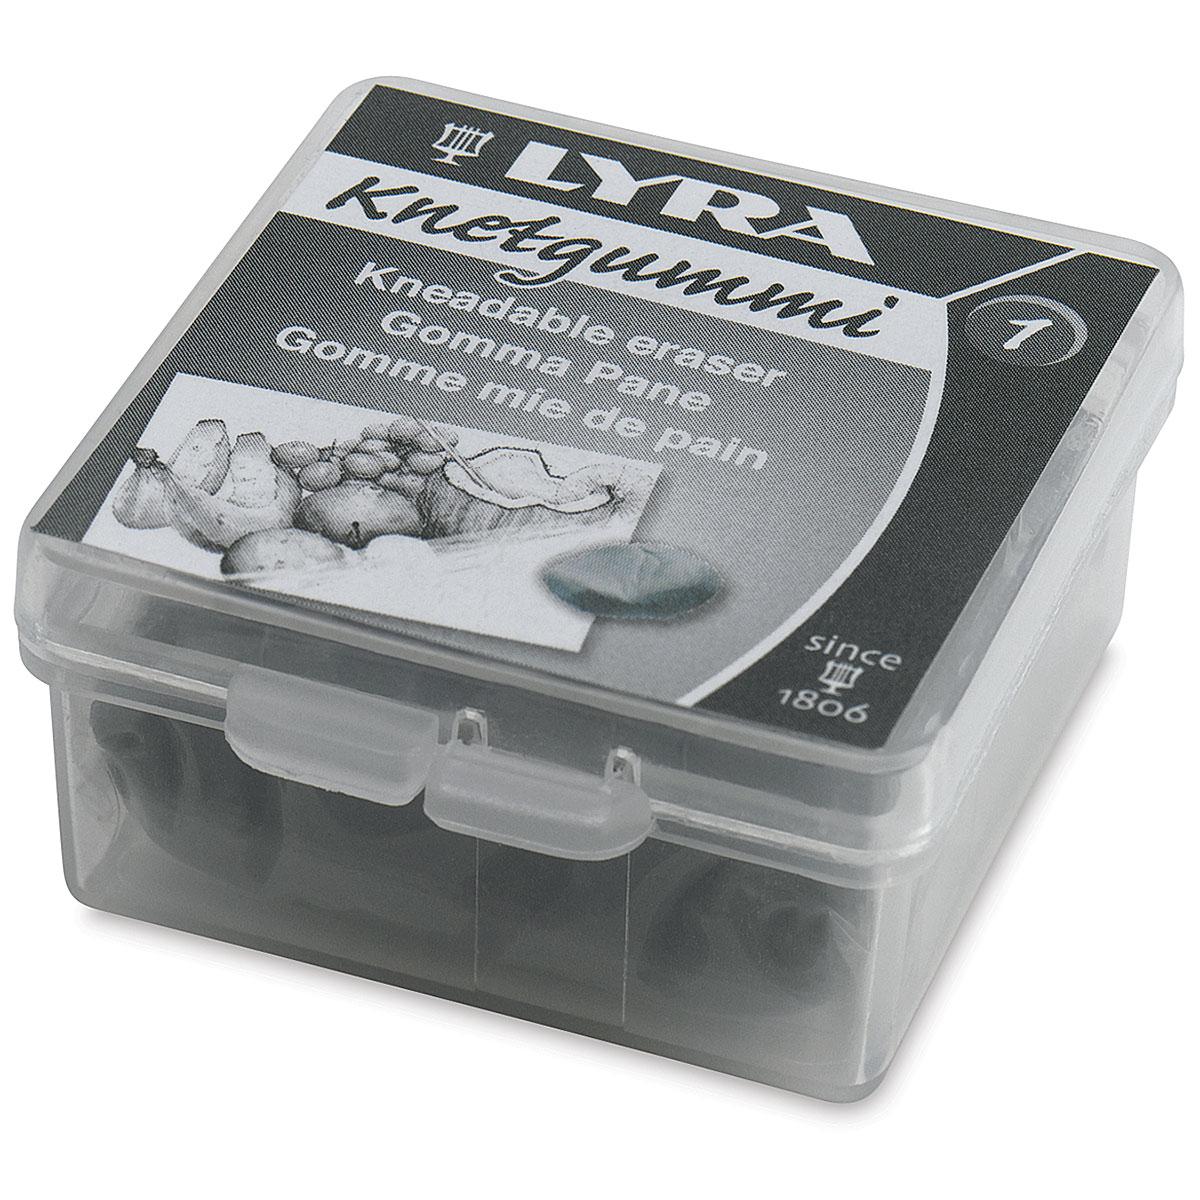 Lyra Kneadable Eraser - with Plastic Box